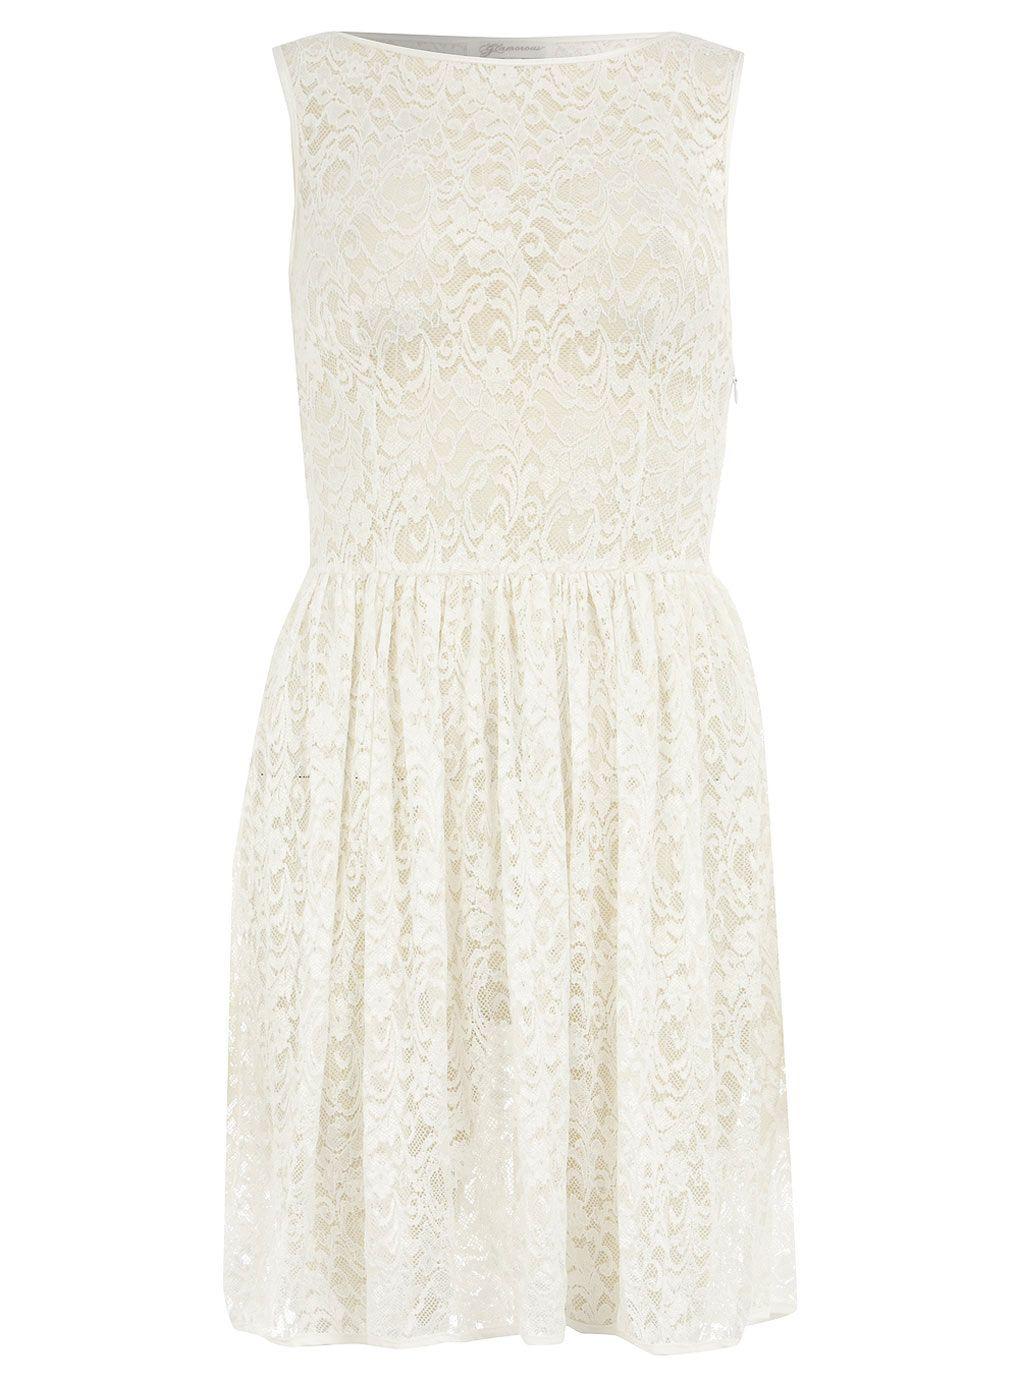 White Lace Overlay Dress Lace Dresses Dresses Dorothy Perkins United States White Overlay Dress Dresses Rehersal Dinner Dresses [ 1384 x 1019 Pixel ]